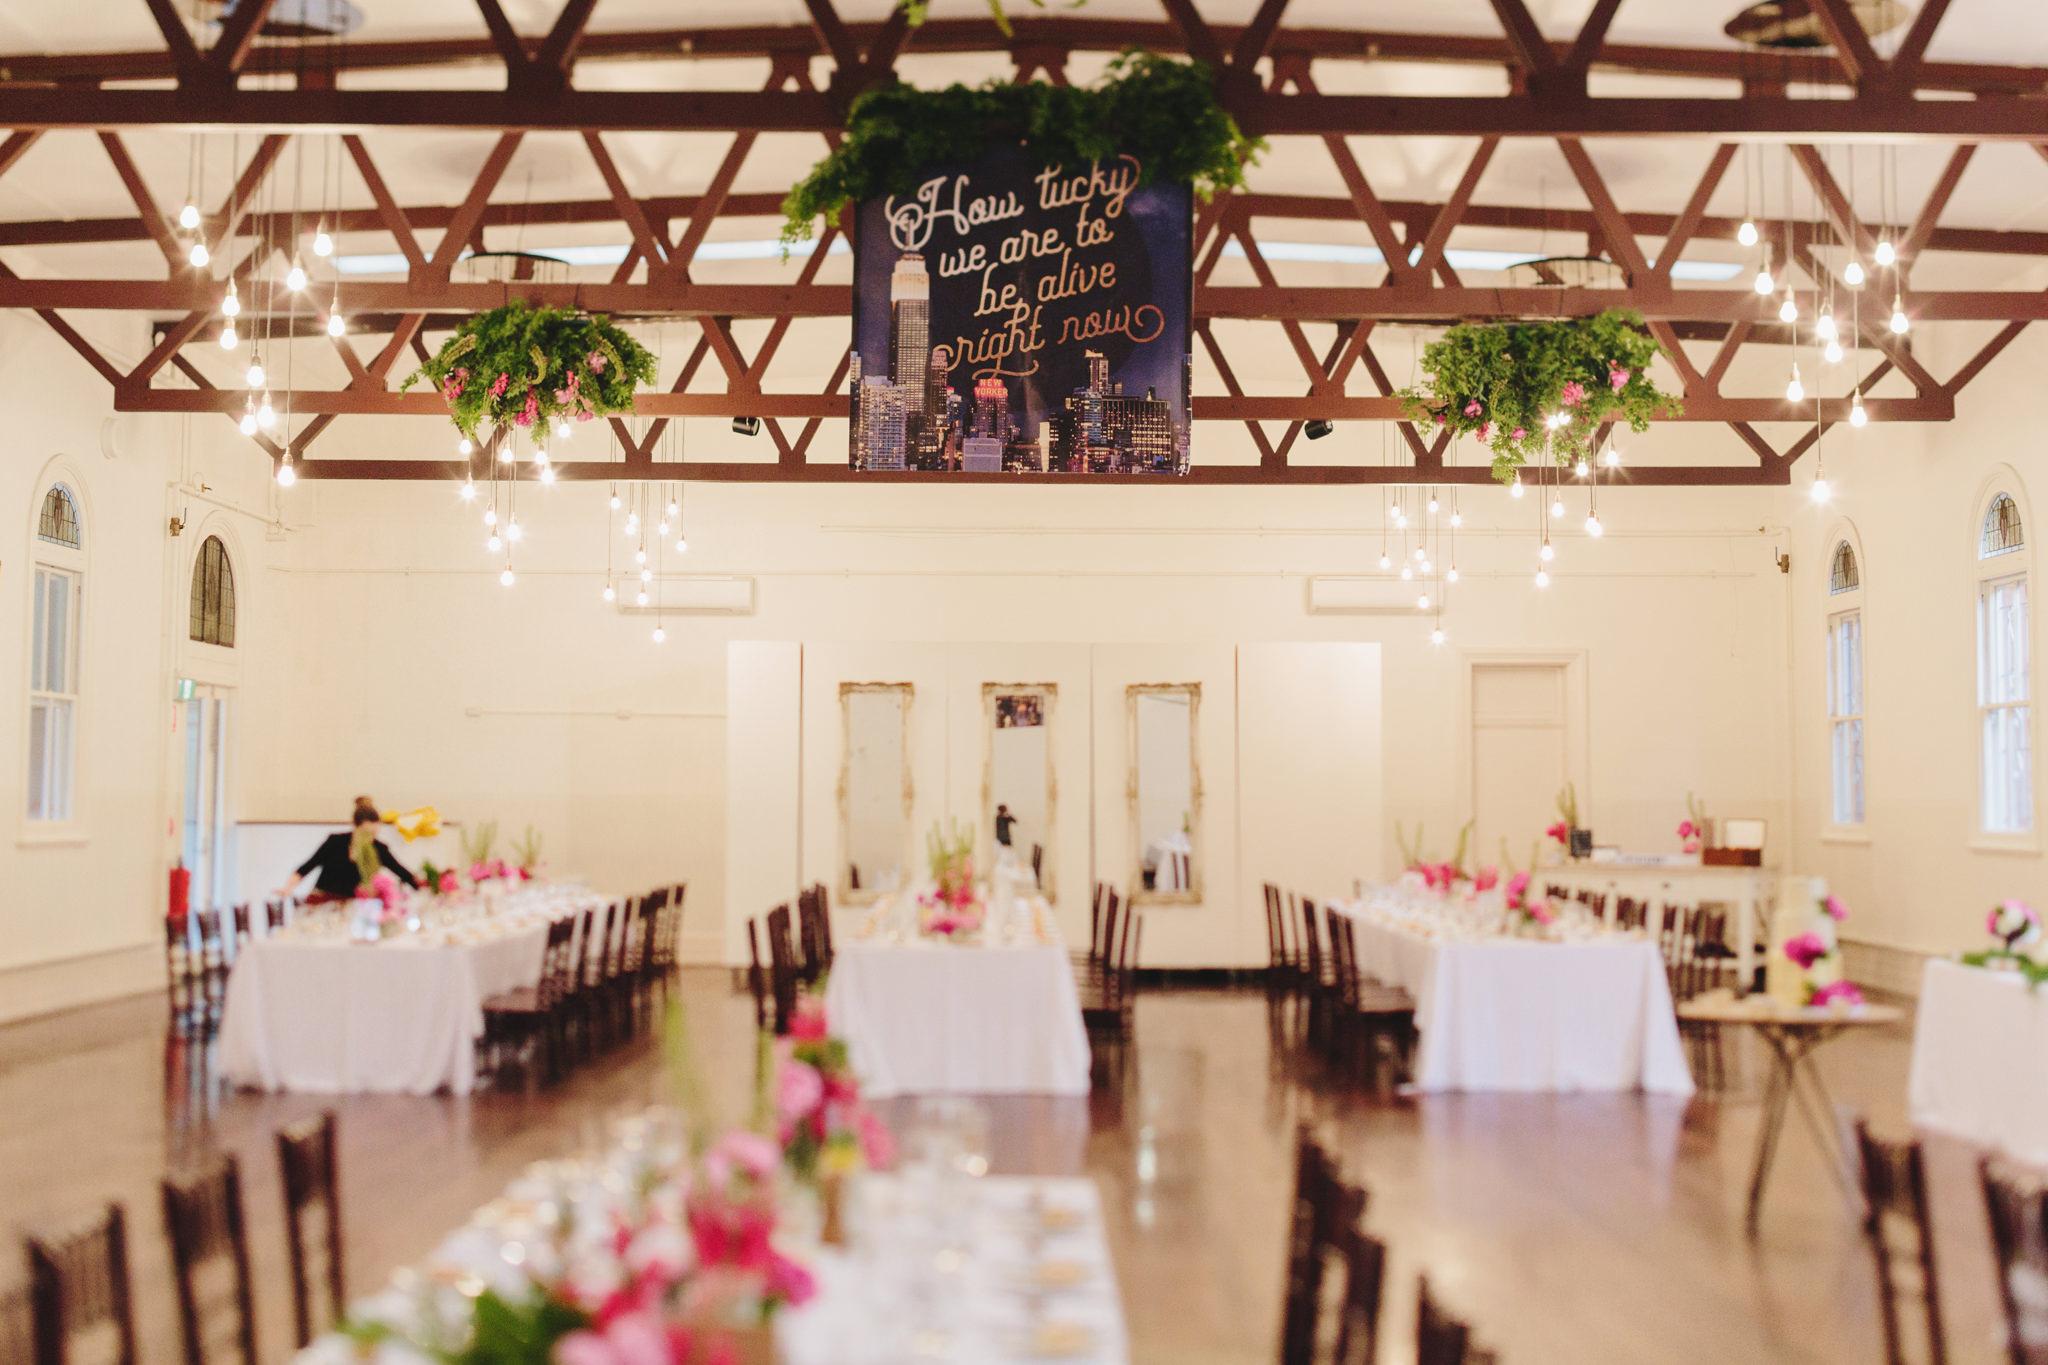 Abbotsford_Convent_Wedding_Peter_Anna091.JPG